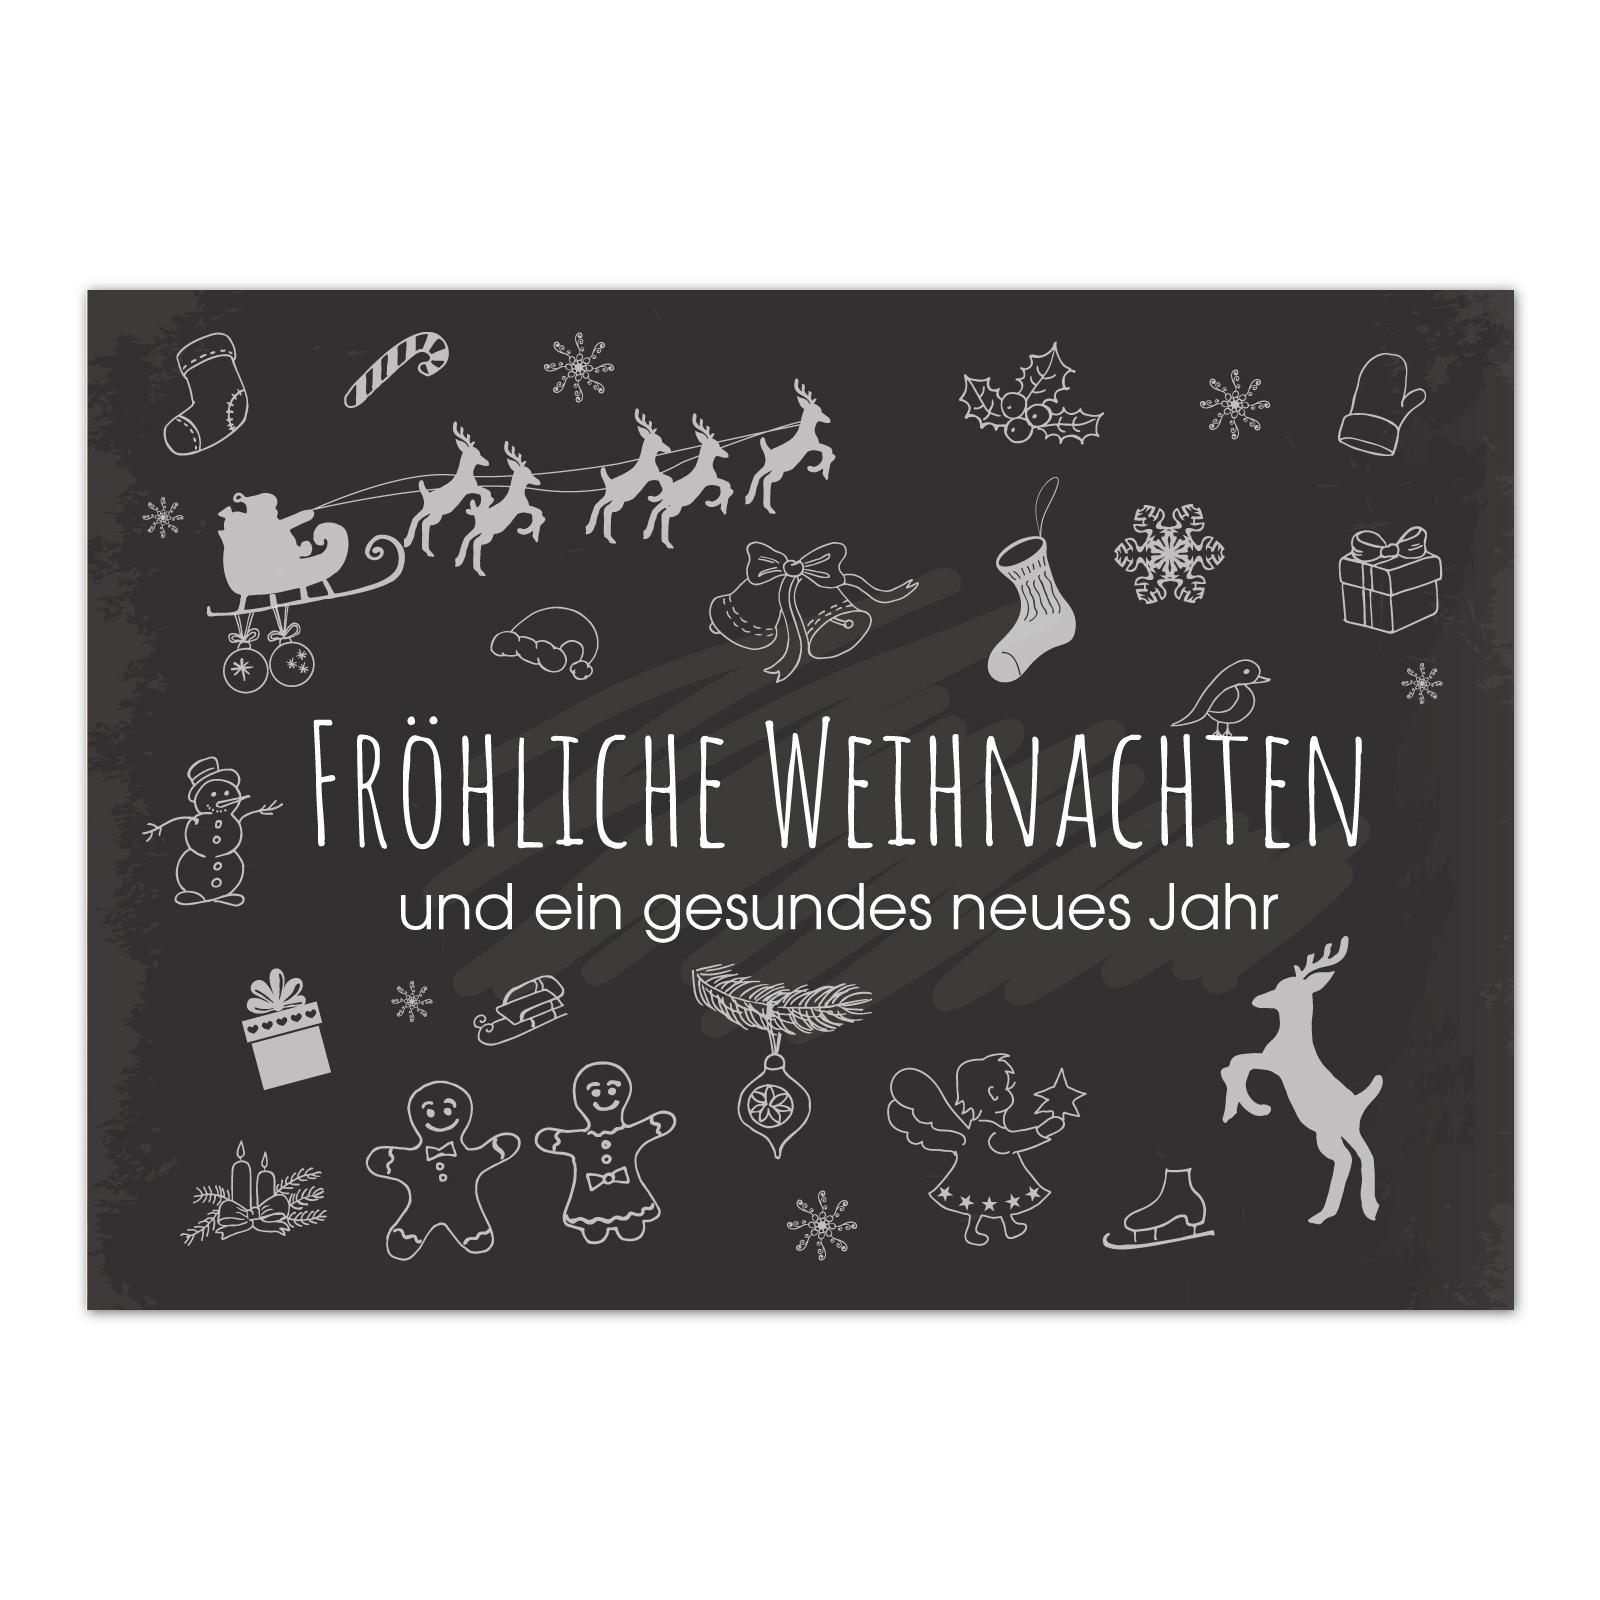 15 x weihnachtskarten tafel kreide look im postkarten. Black Bedroom Furniture Sets. Home Design Ideas